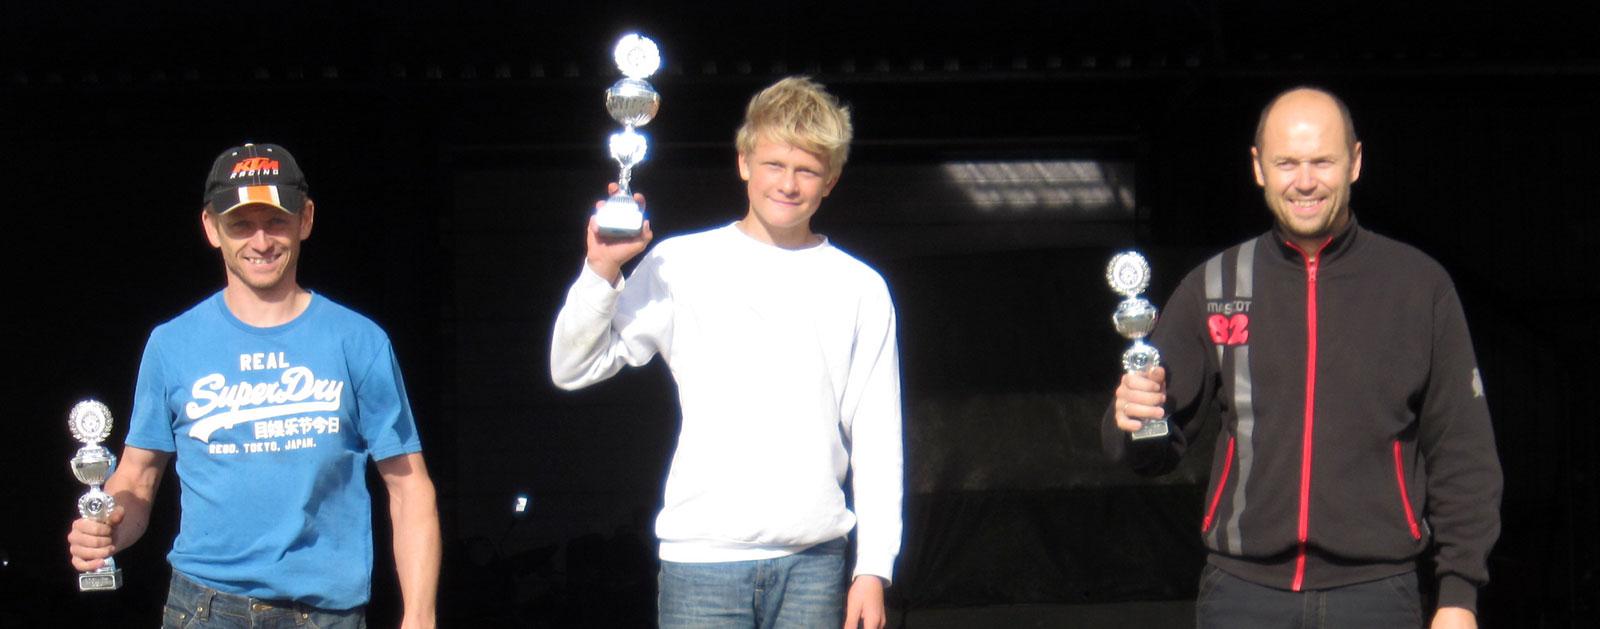 Supermotard Danmarksmesterskab SM A Nørresundby August 2014 1. Simon Winther 2. Andreas Mikkelsen 3. Brian Jensen